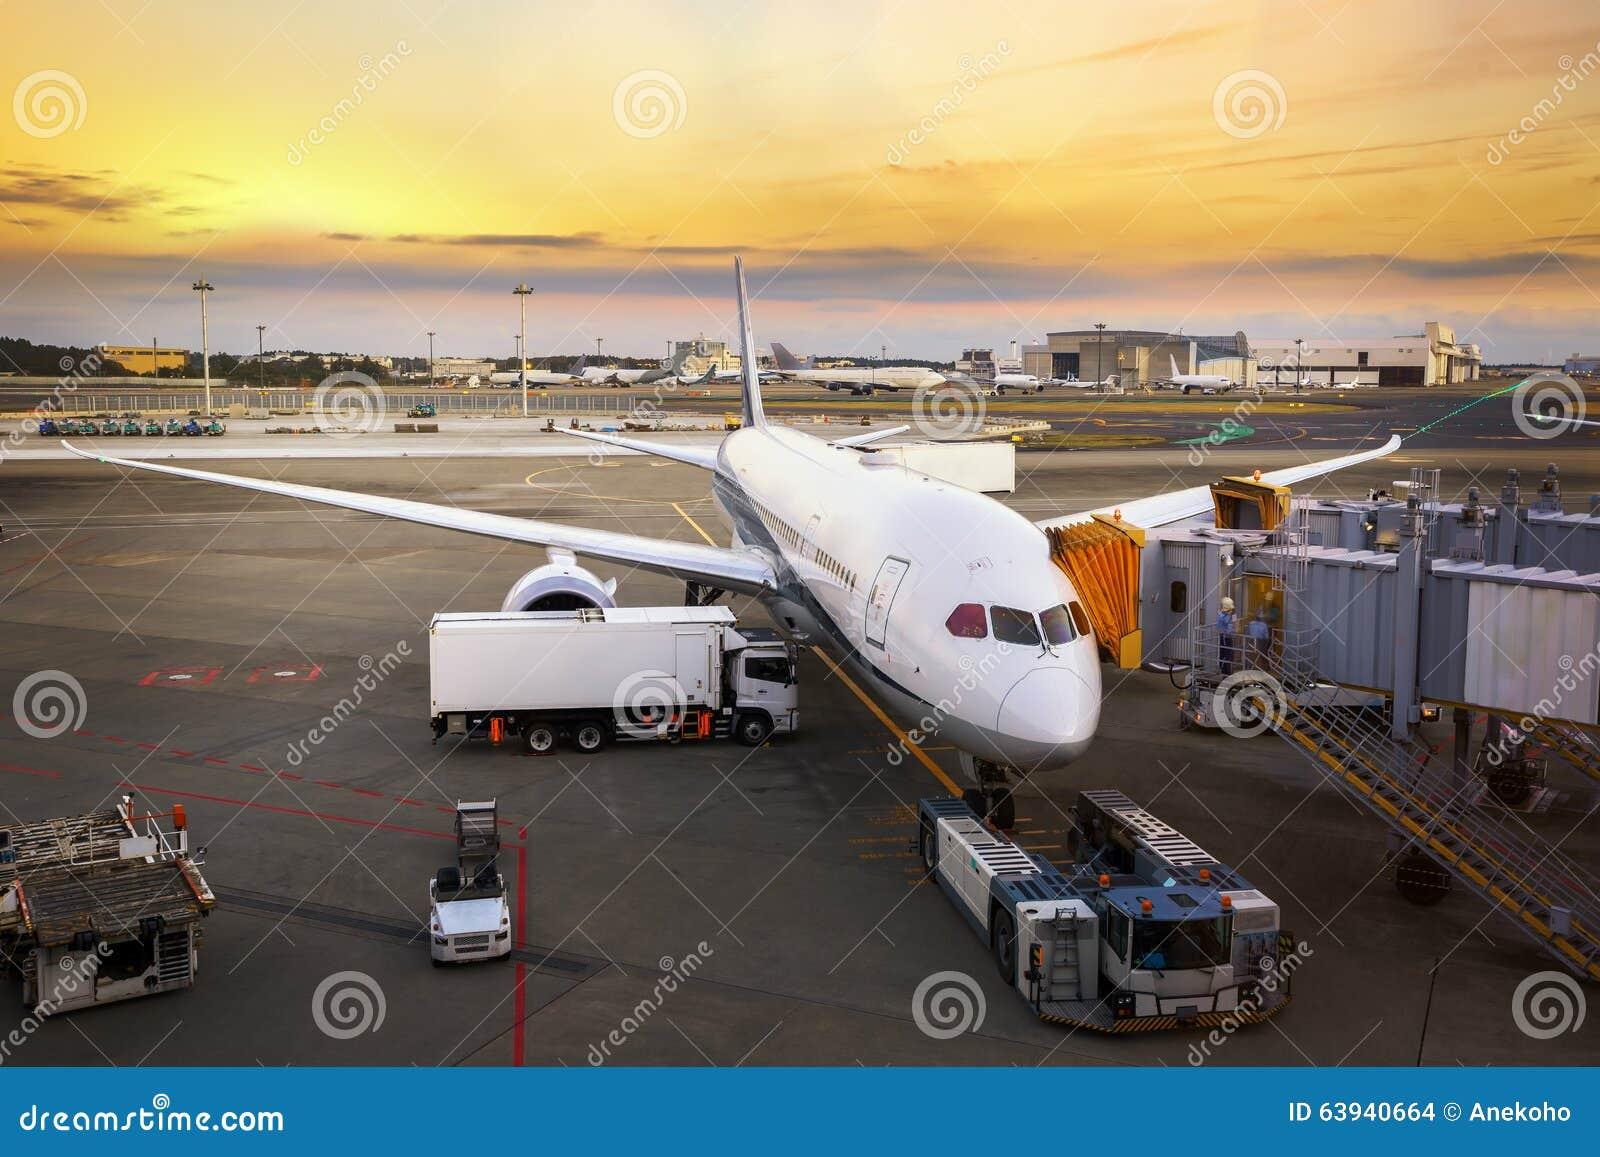 Air cargo transportation concept. - Creative Market